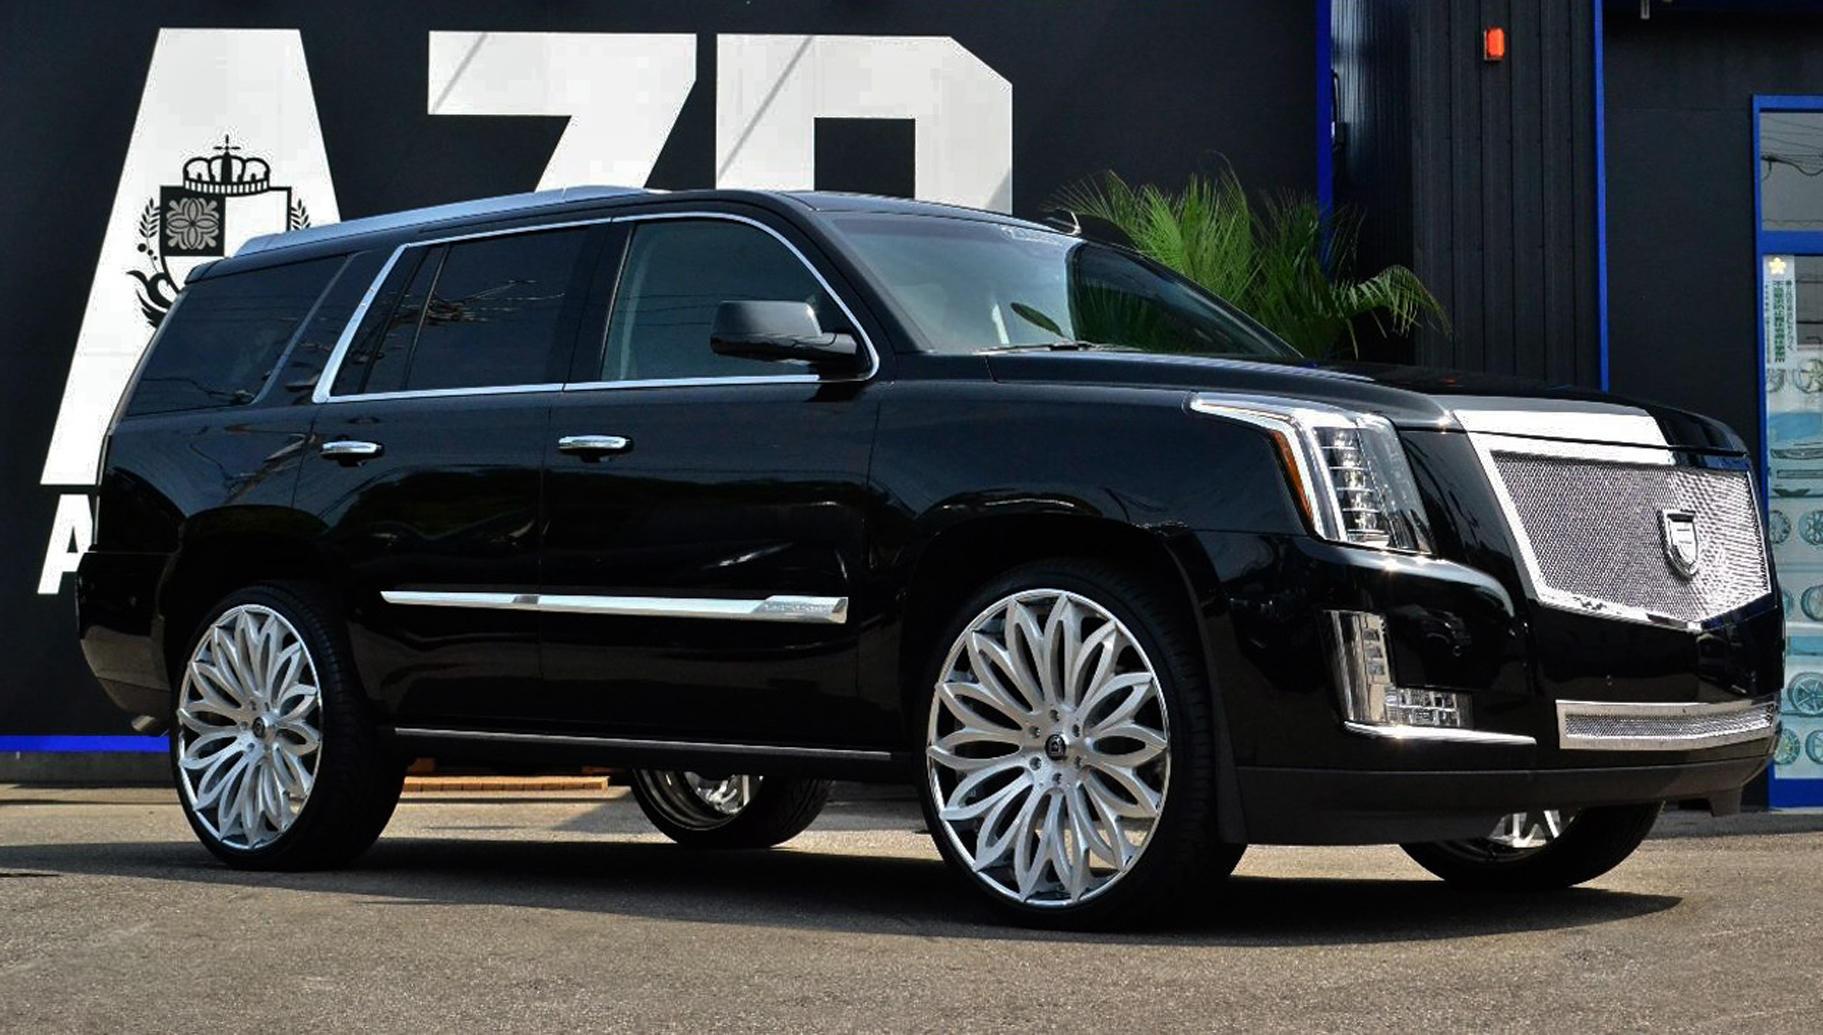 Lexani Luxury Wheels | Vehicle Gallery - 2015 Cadillac Escalade